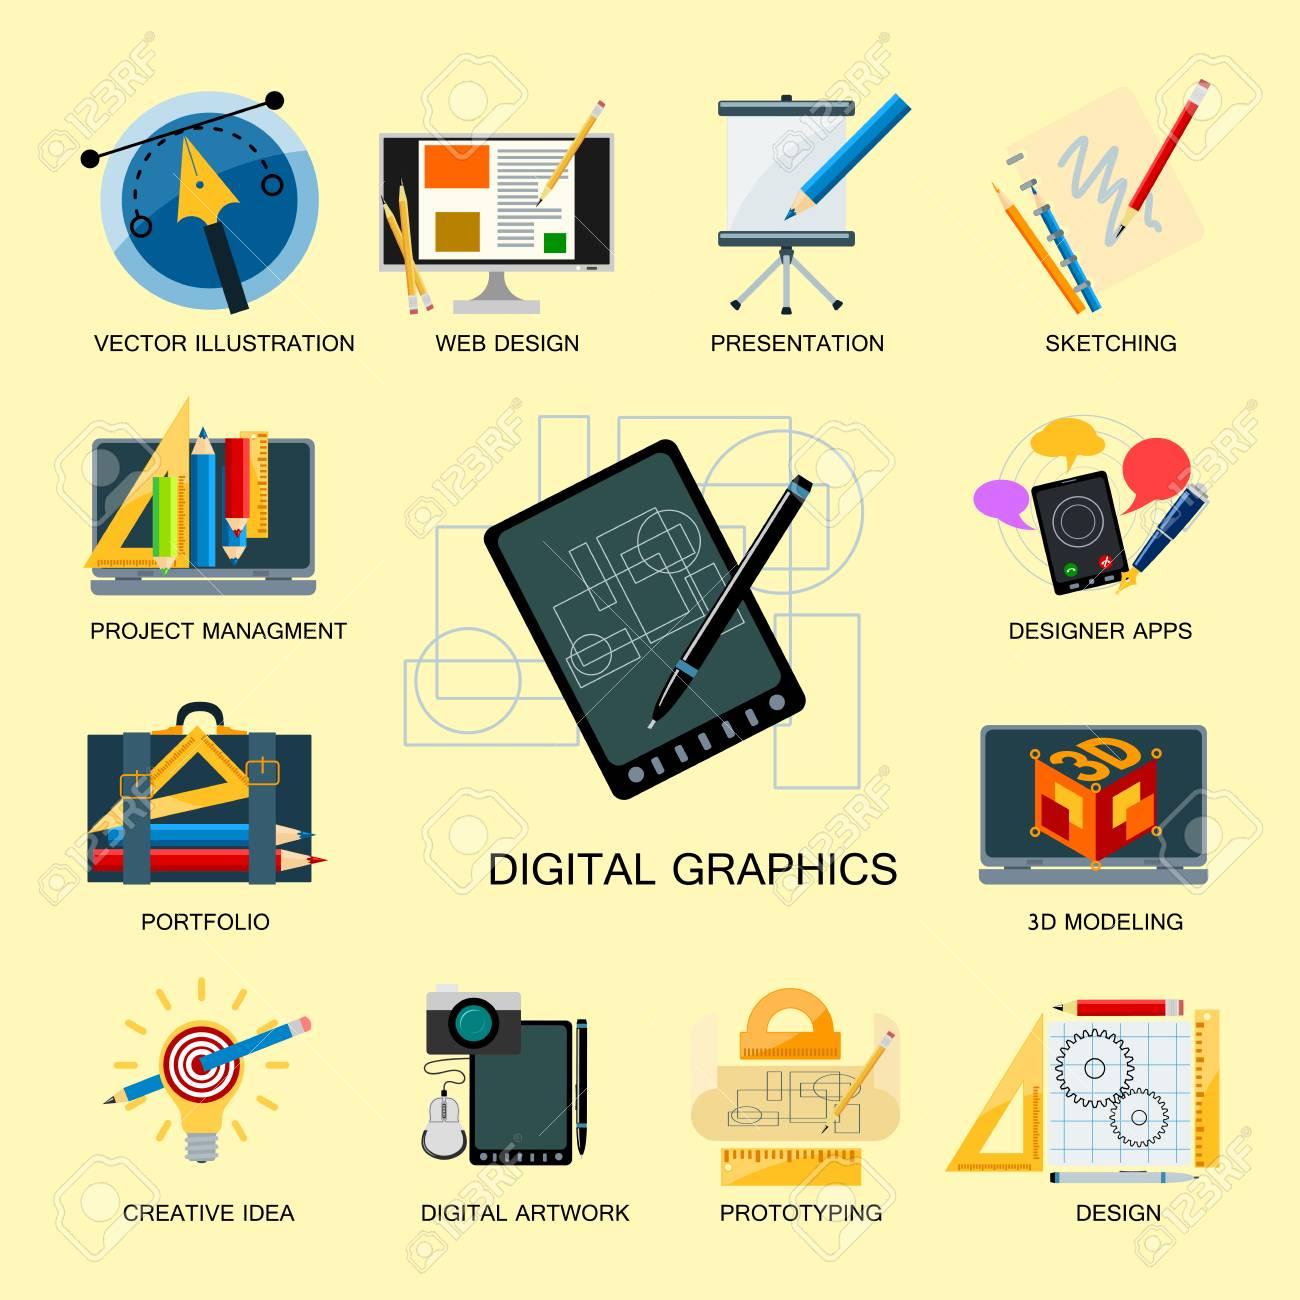 Creativity Icons Imagination Vector Illustration Abstract Colorful Flat Creative Process Design Development Elements Stock